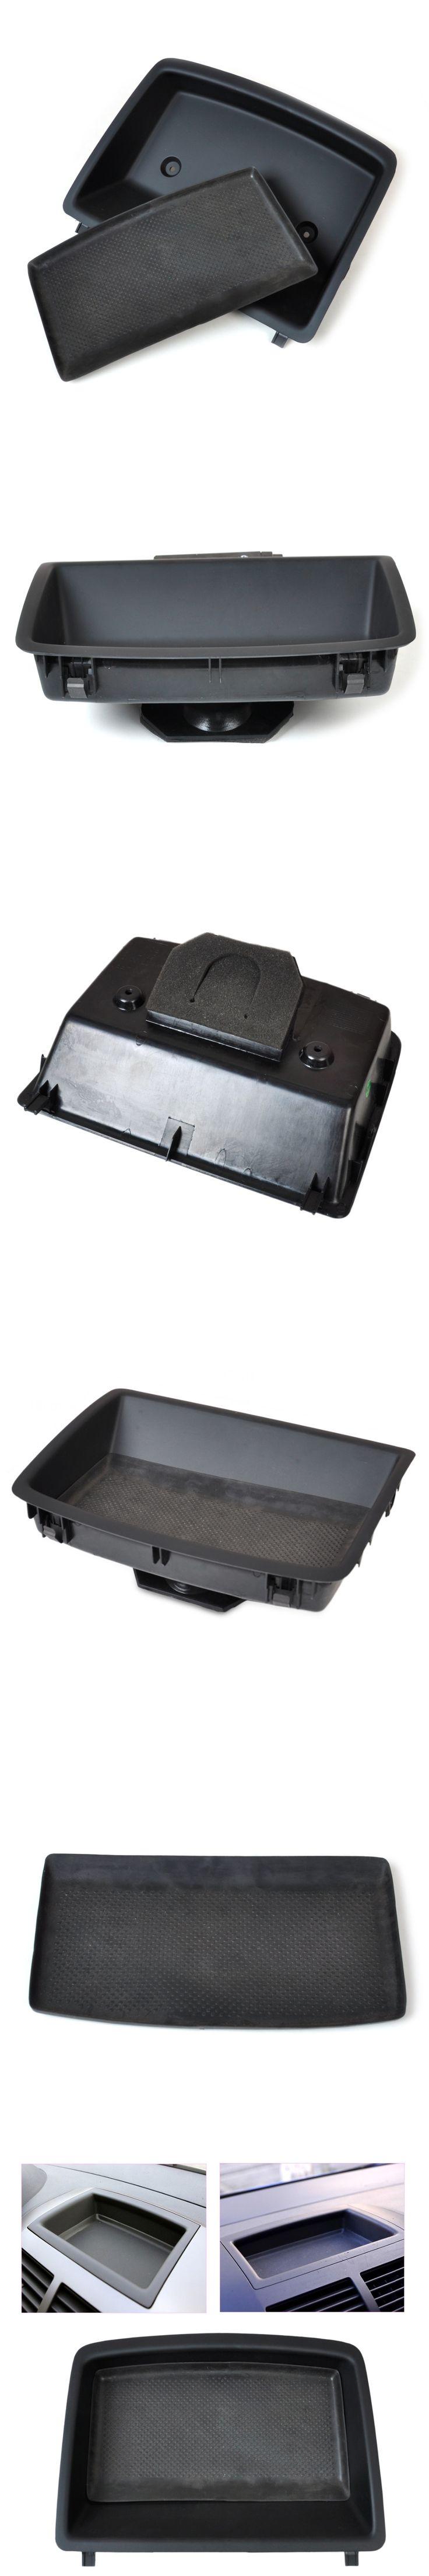 DWCX Center Storage Tray Shelf for VW Jetta Golf MK5 GTI MK5 R32 Jetta MK5 GLI MK5 GTI Rabbit 2006 2007 2008 2009 1K0 857 921D